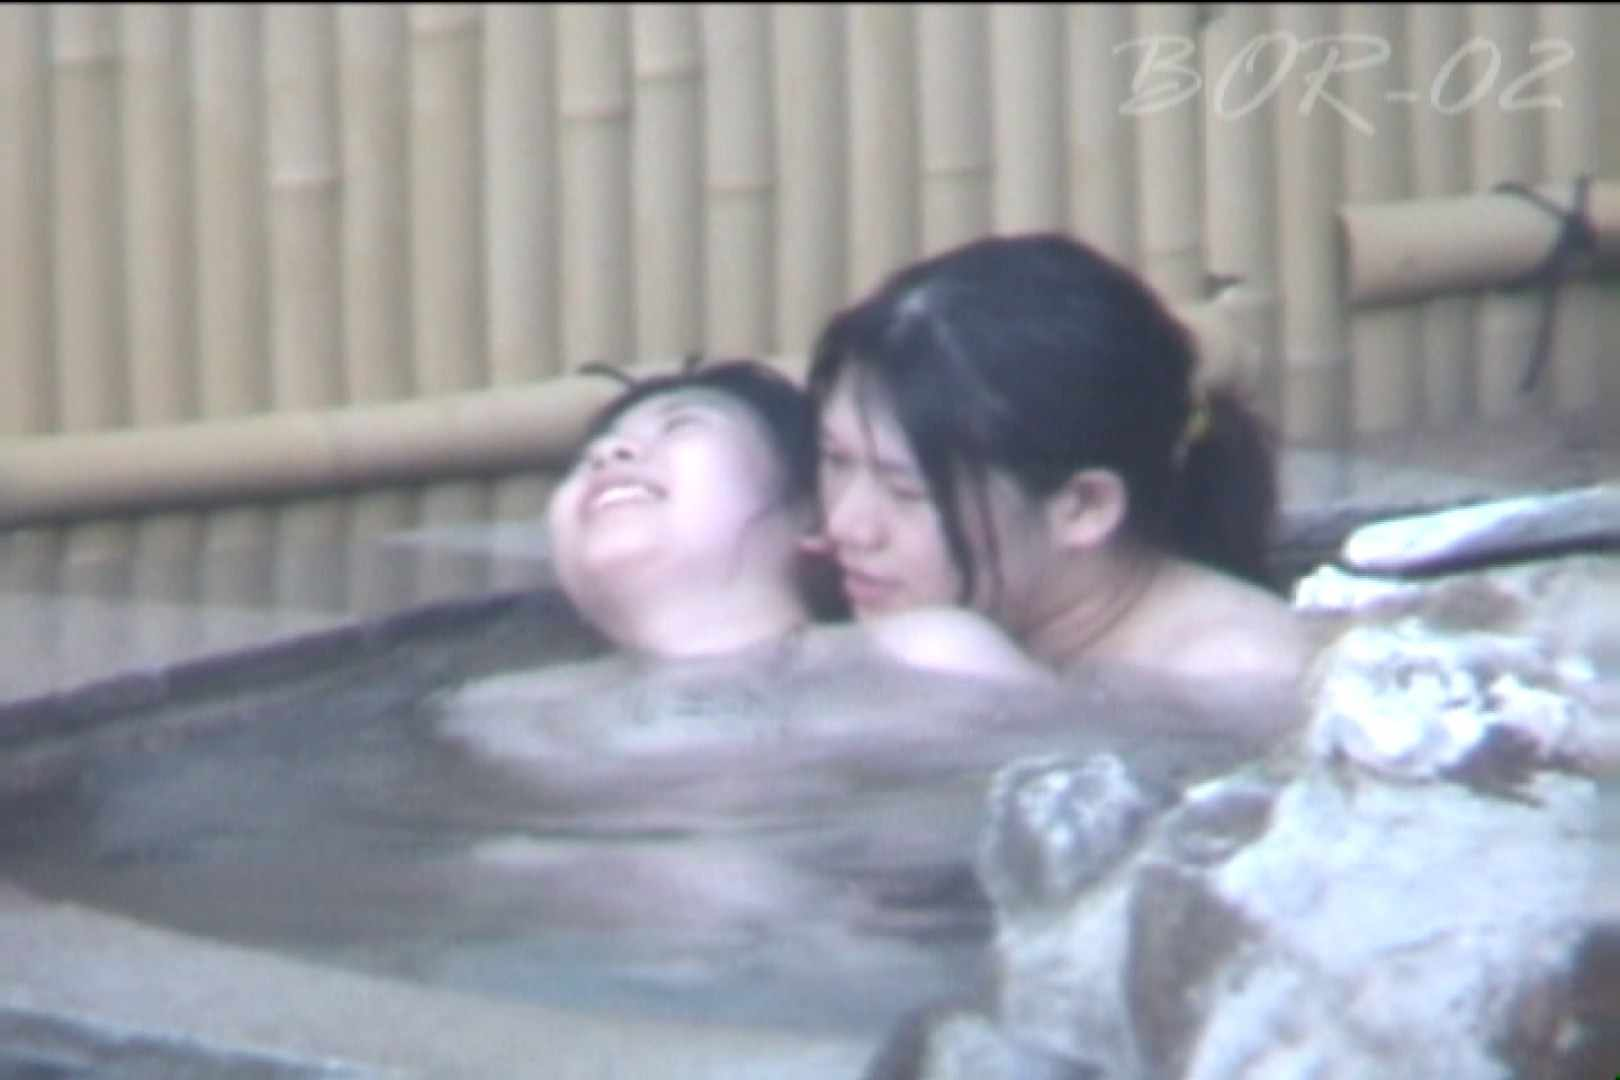 Aquaな露天風呂Vol.471 露天風呂突入 | 盗撮師作品  70pic 31